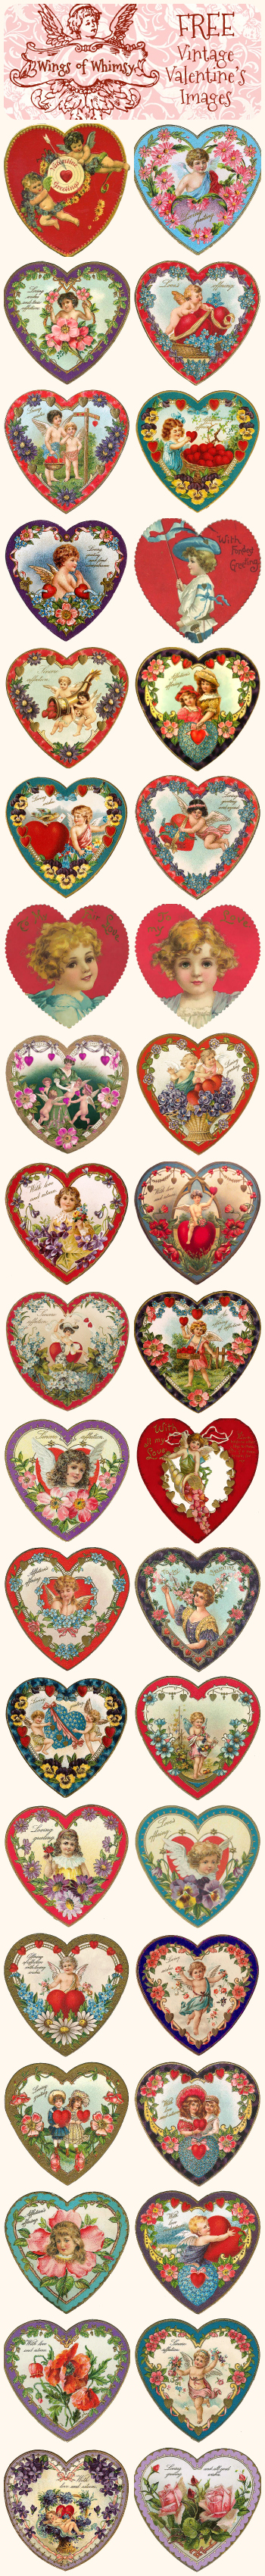 happy valentines day wallpaper 2014